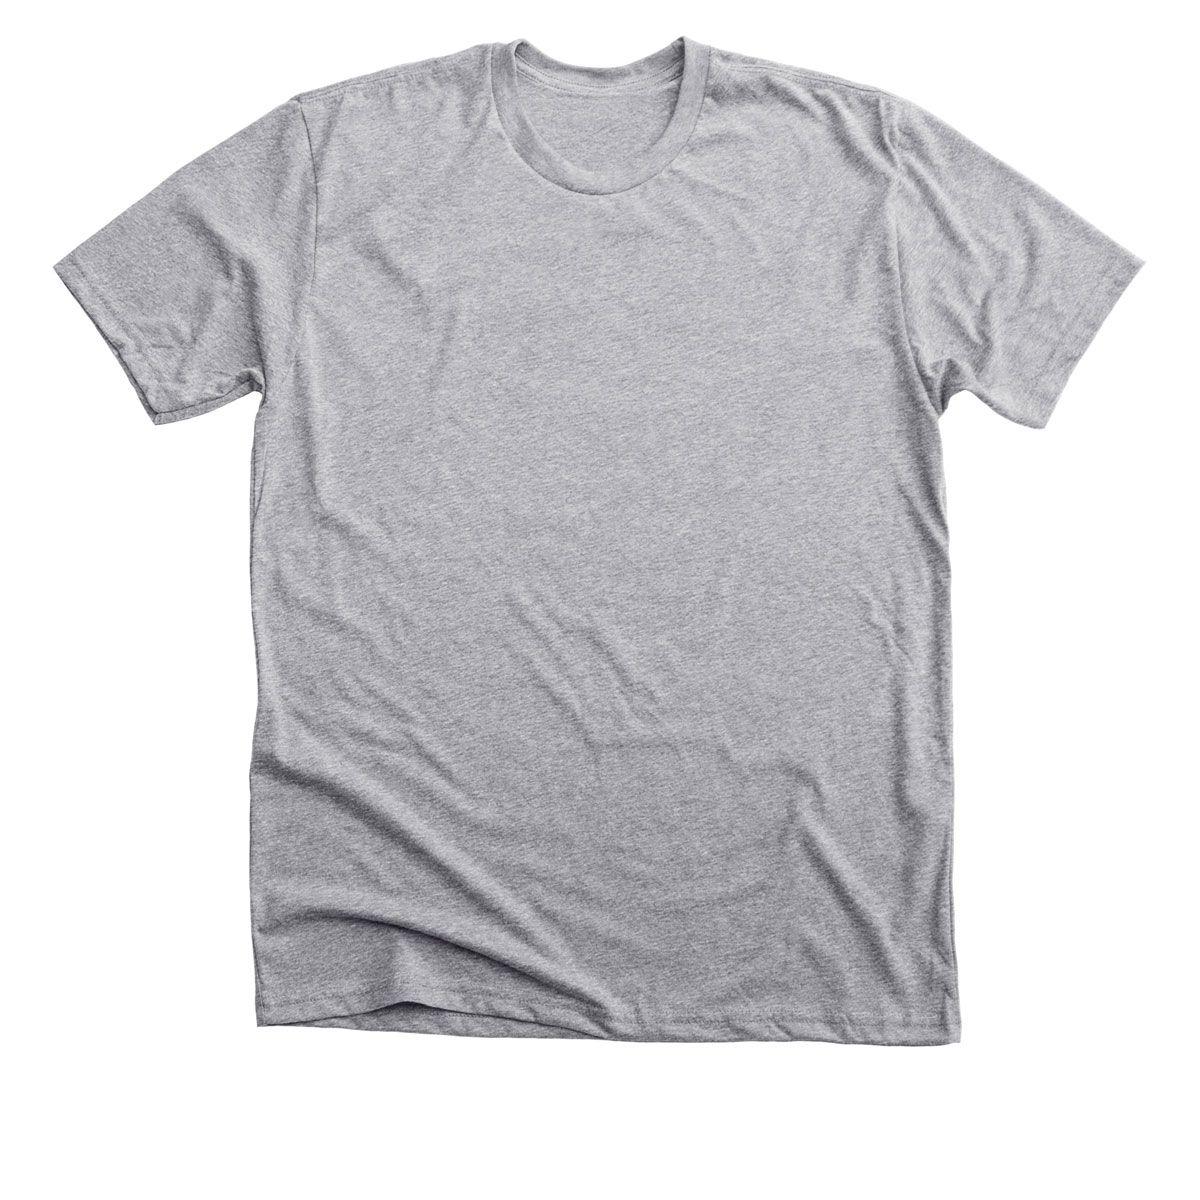 T Shirt Design Tool Make Your Own Shirt Design Bonfire Custom Shirts Design Your Own Shirt Make Your Own Shirt